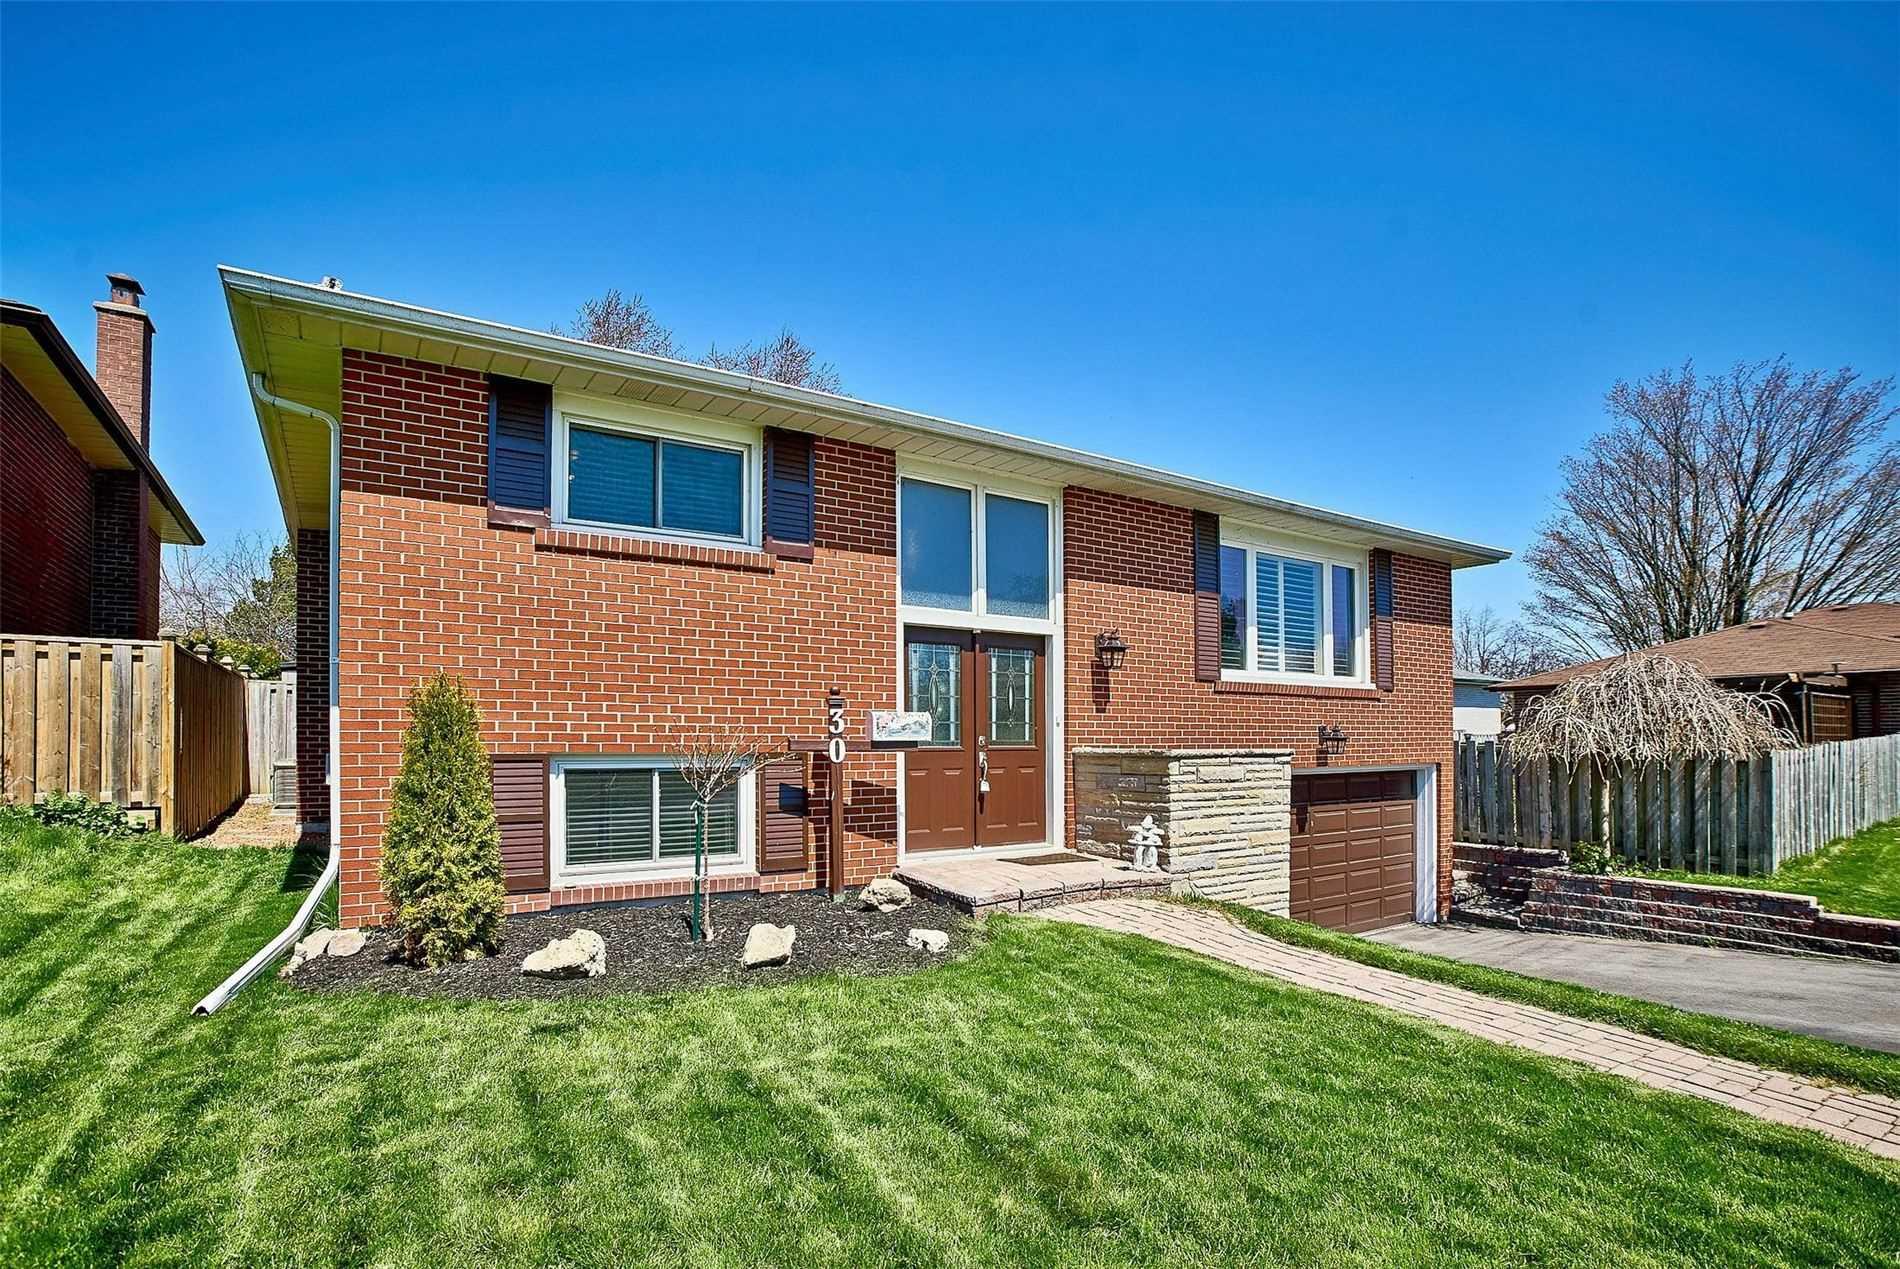 30 Shea Crt, Toronto, Ontario M1C2G6, 3 Bedrooms Bedrooms, 6 Rooms Rooms,2 BathroomsBathrooms,Detached,For Sale,Shea,E5212351